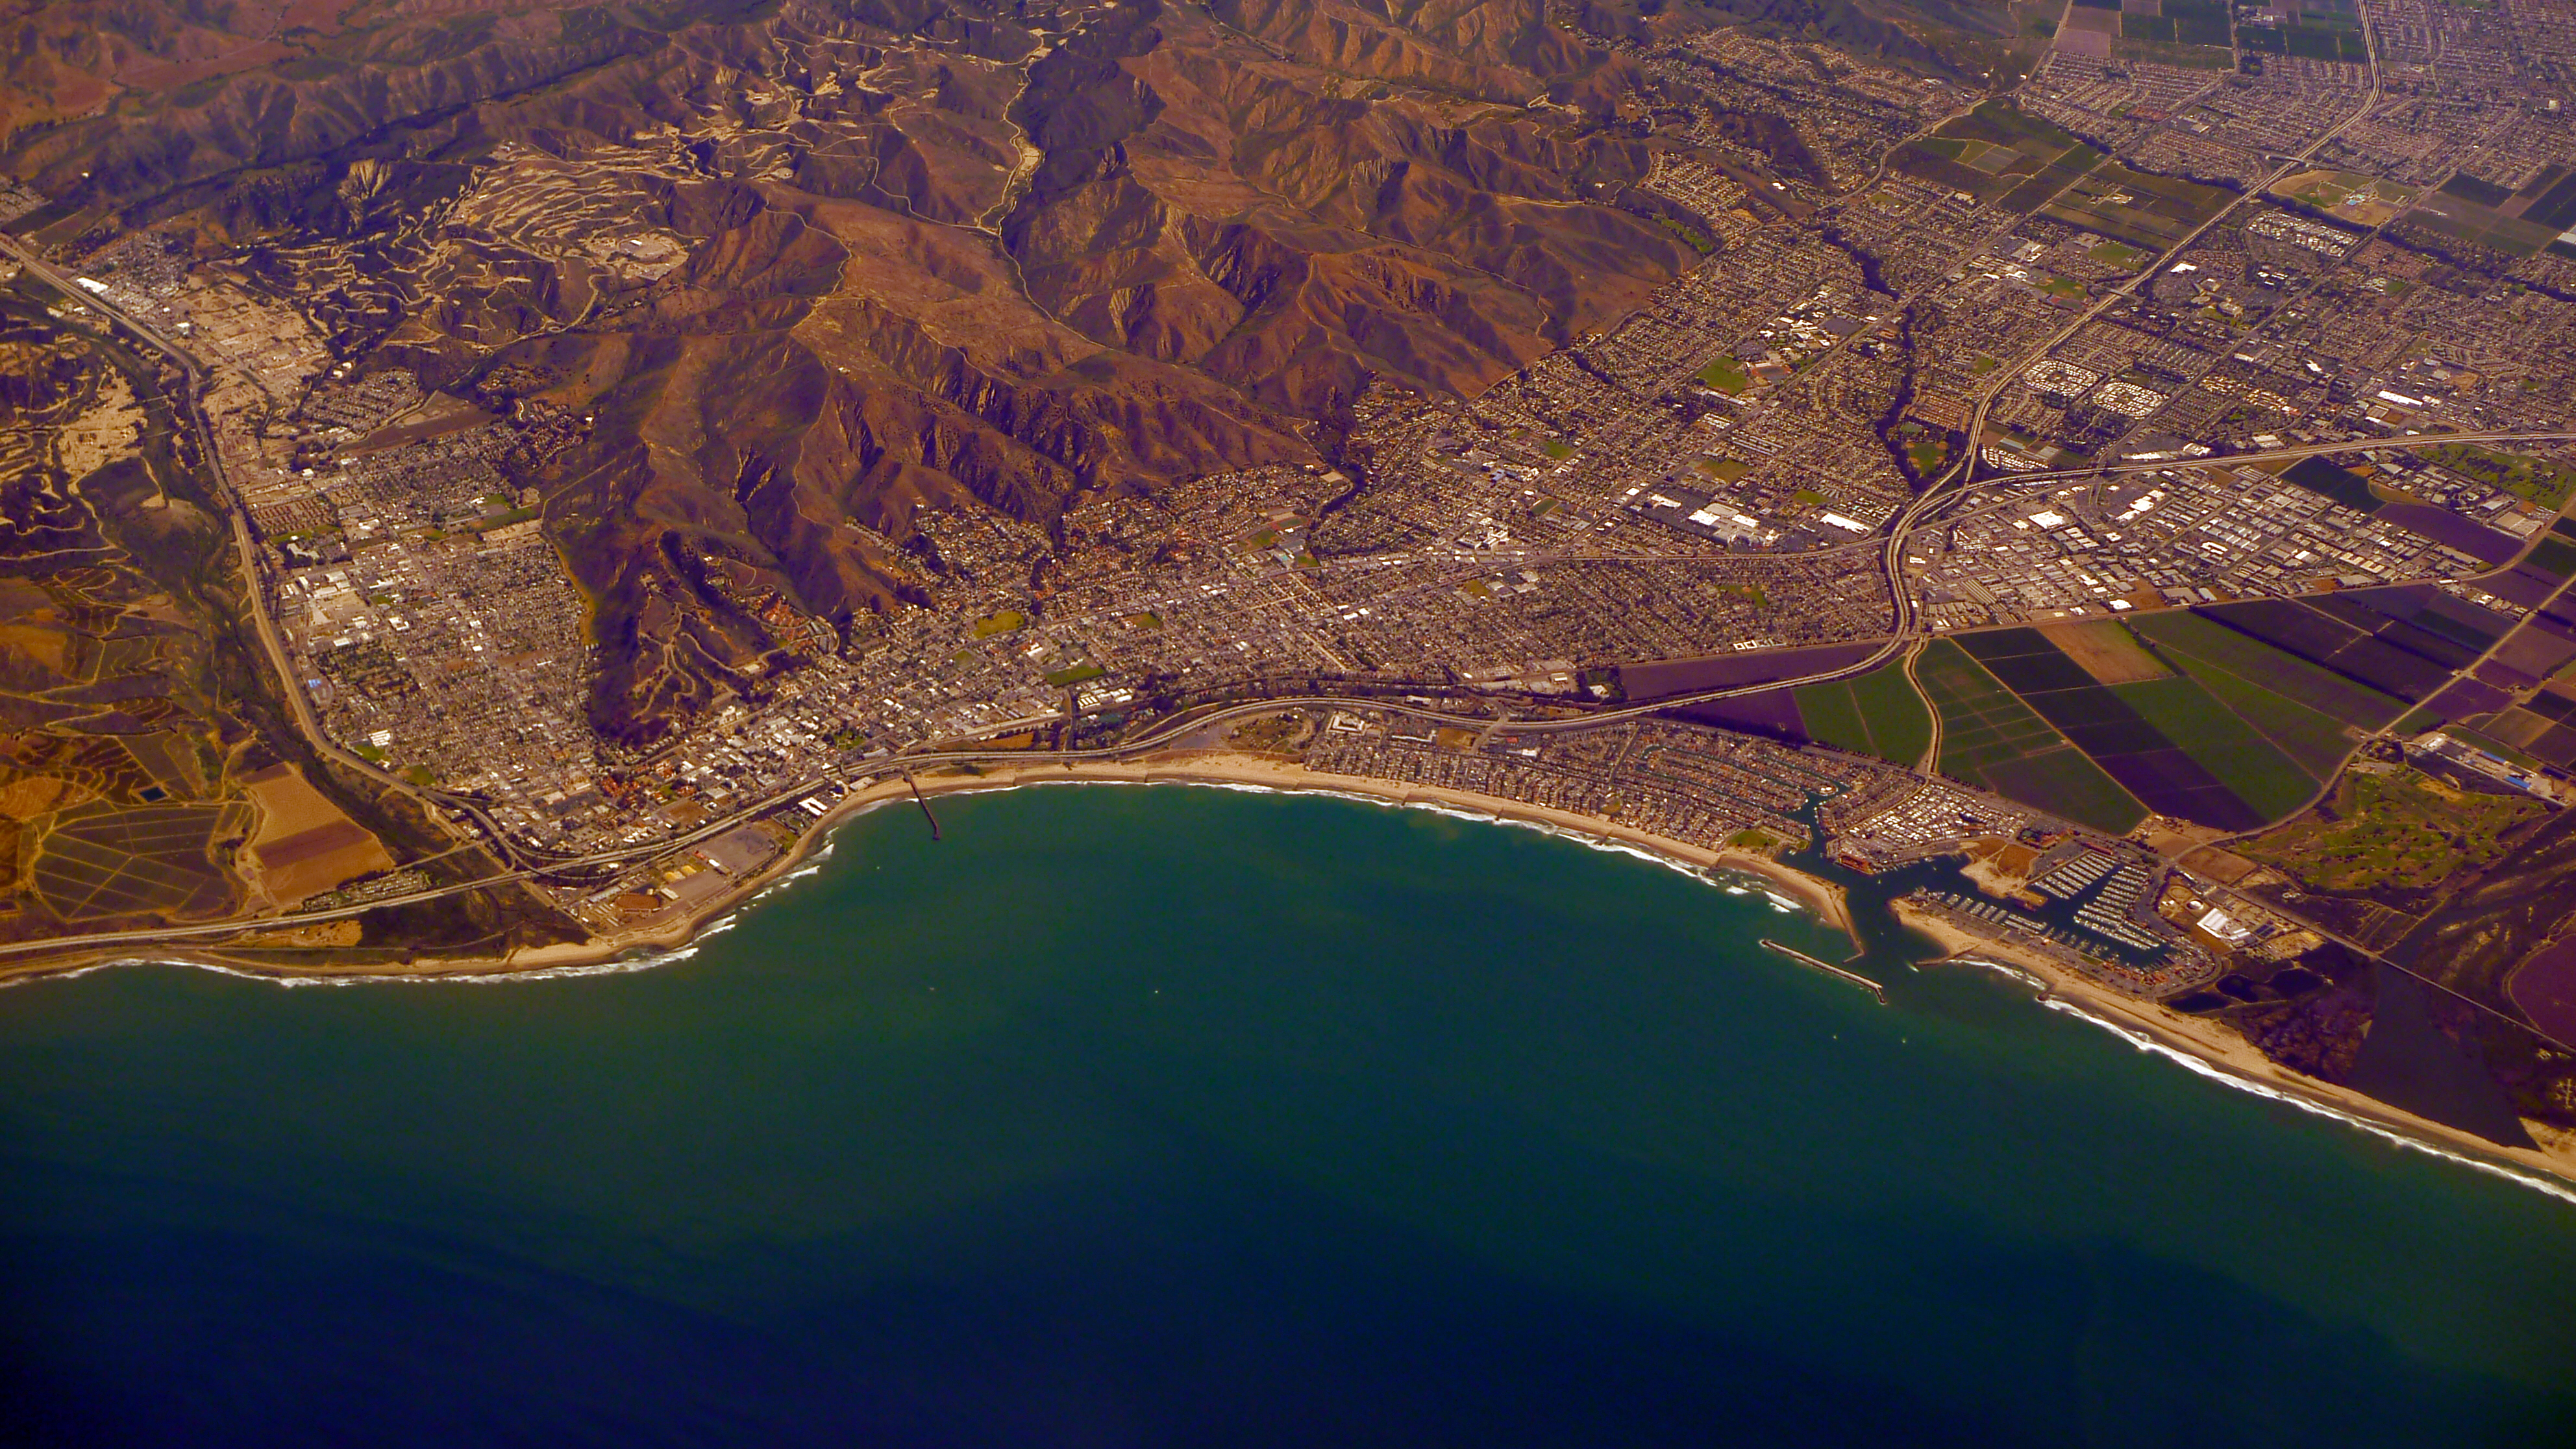 About Ventura, California